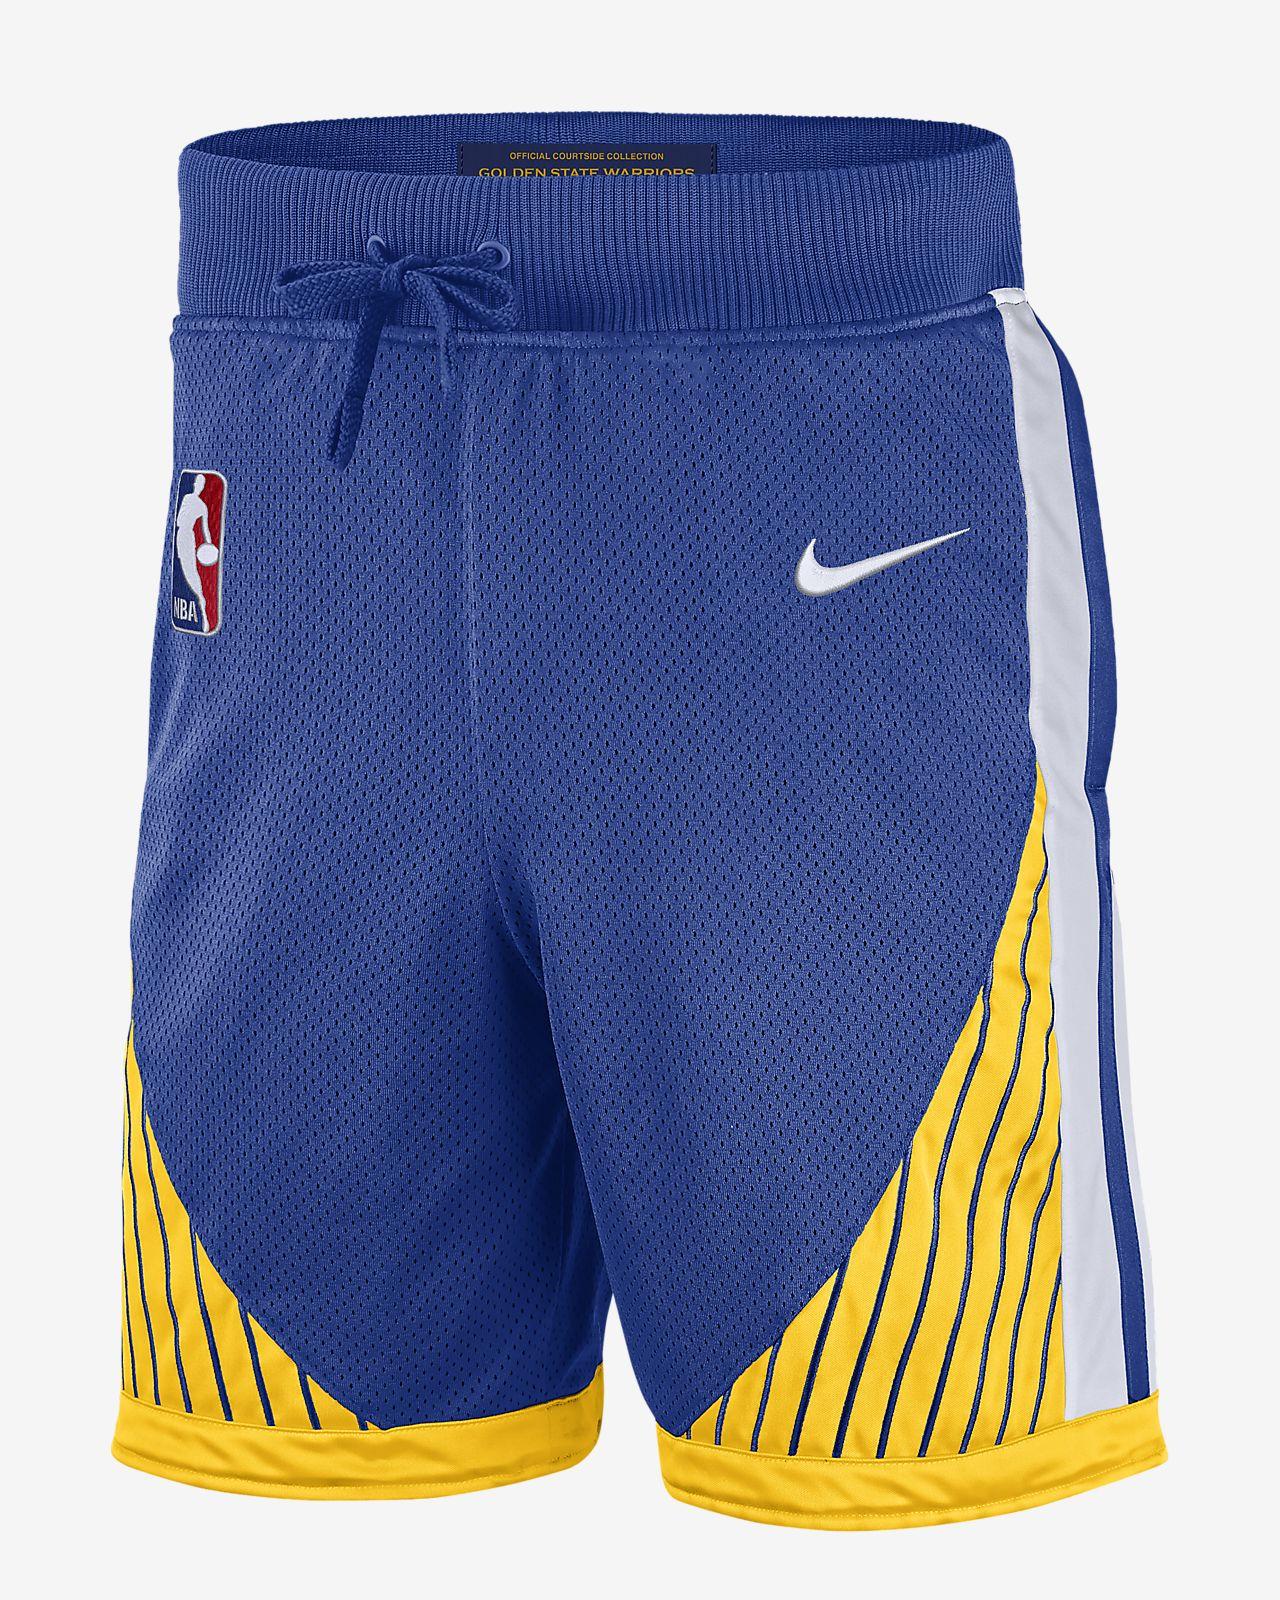 Shorts de la NBA para hombre Golden State Warriors Nike Courtside